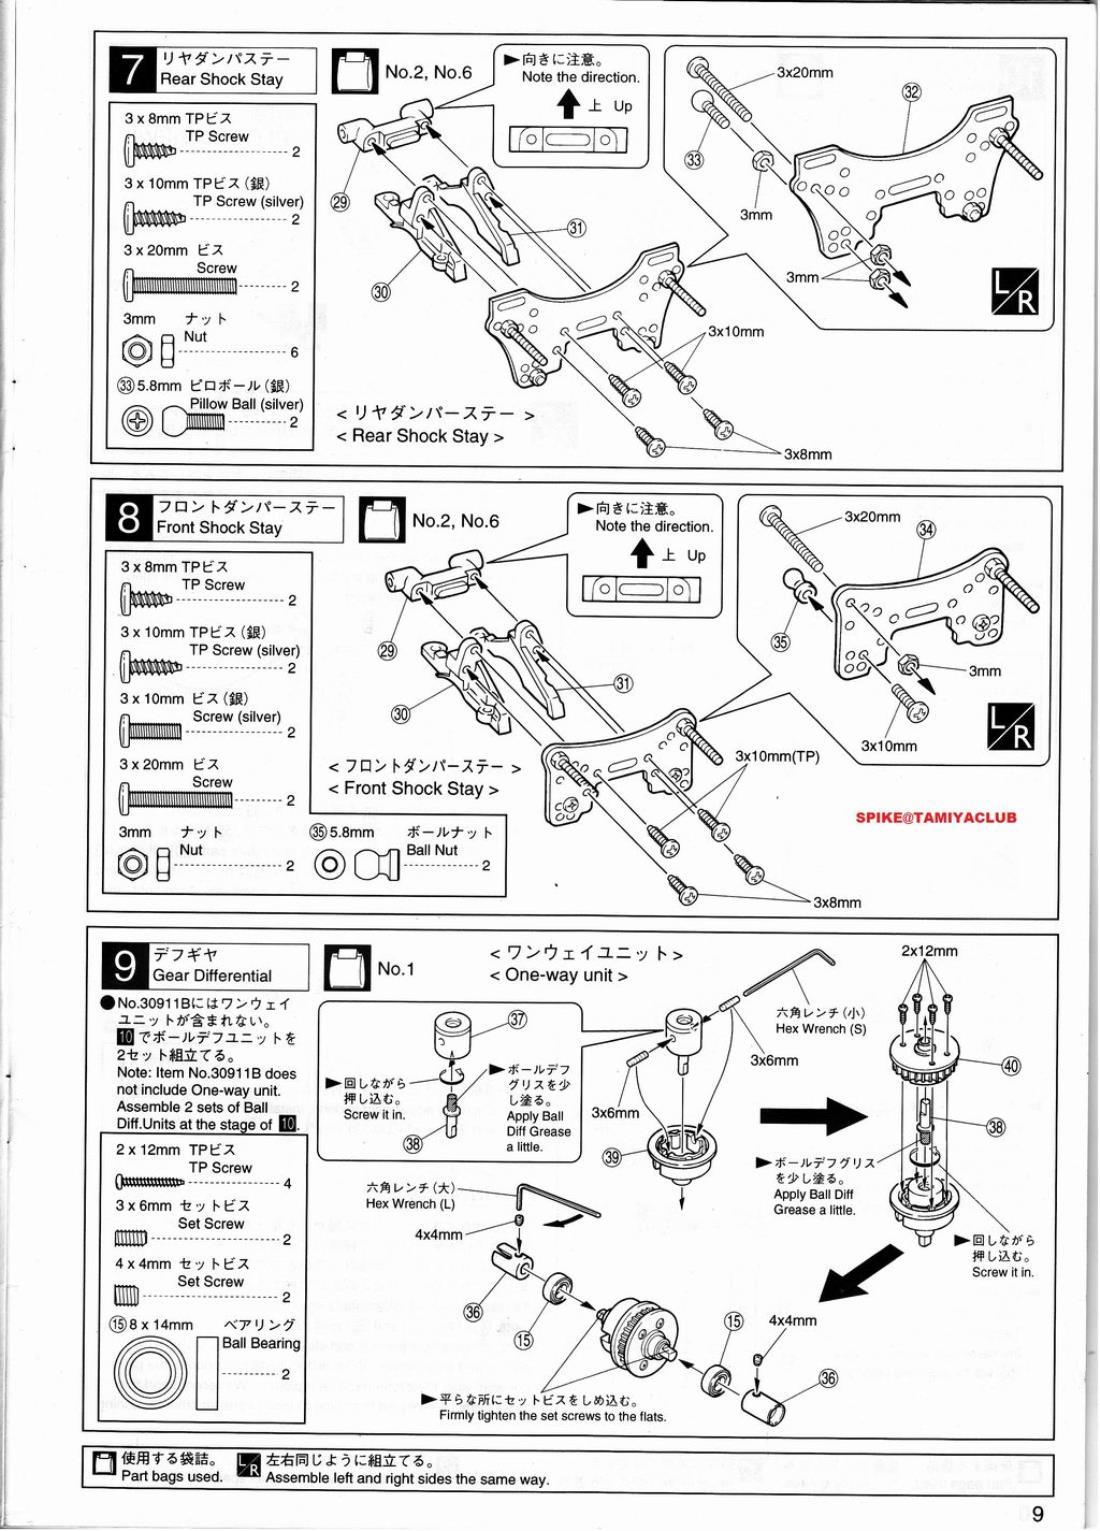 99998: Kyosho from Spike showroom, KYOSHO TF-4 R manual